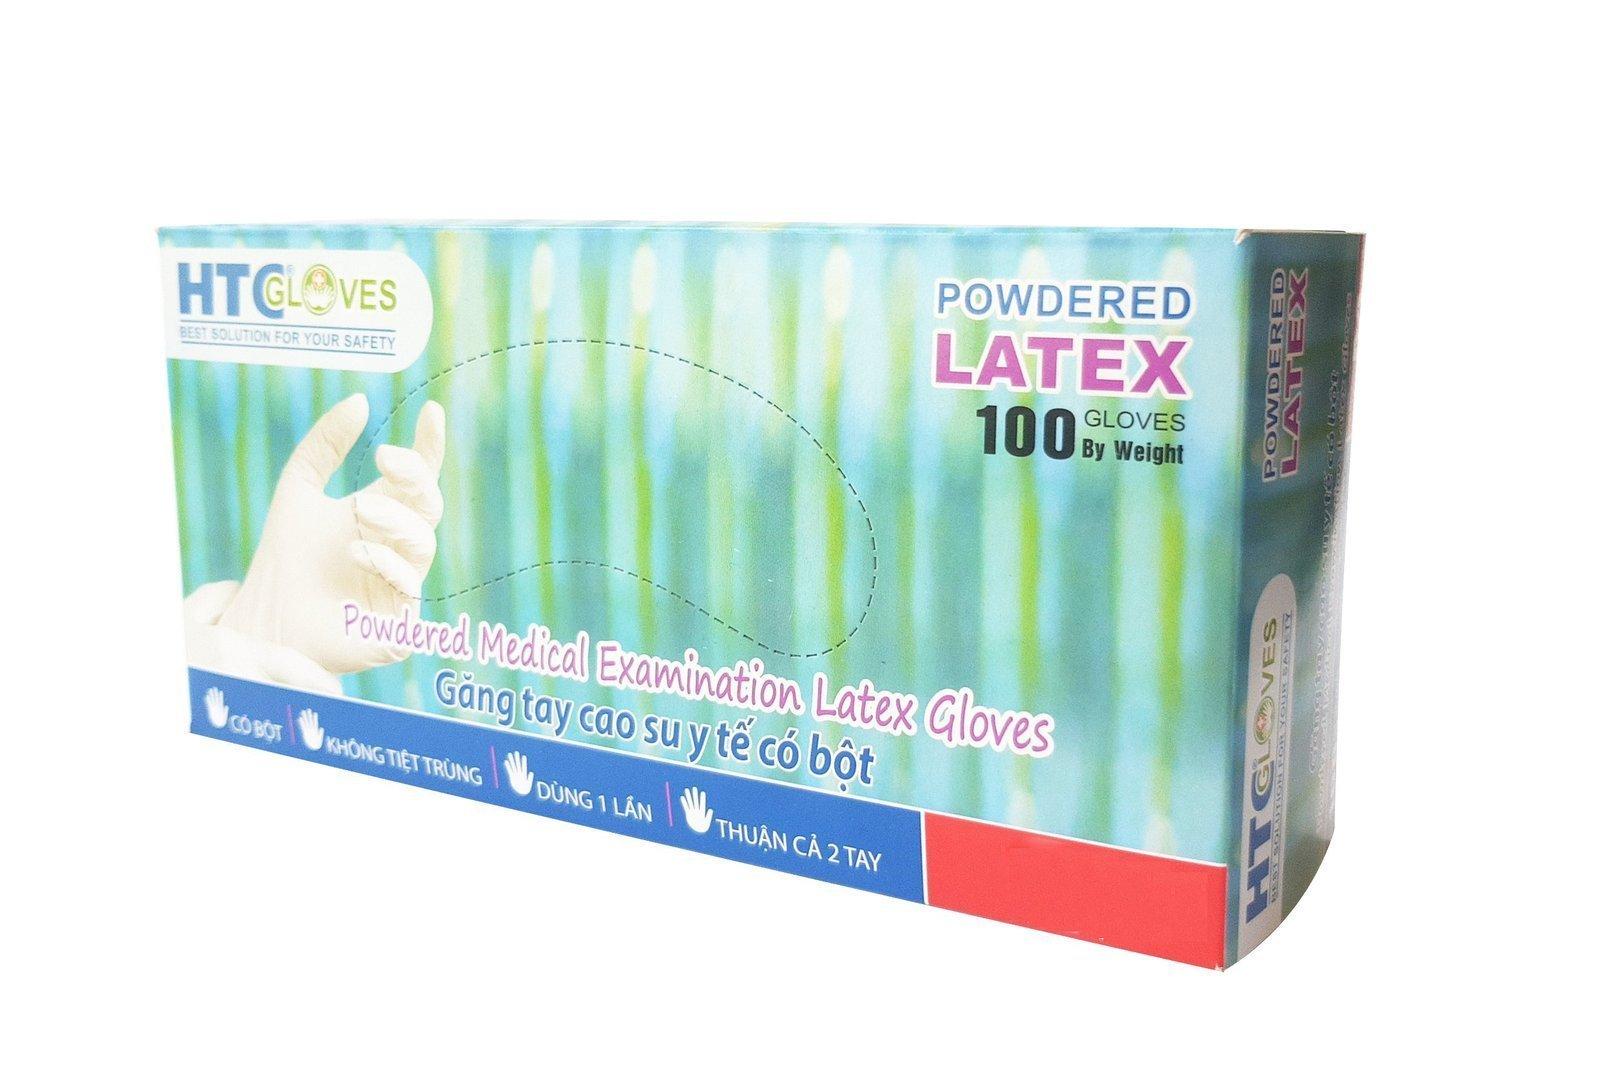 HTCGloves Medical Handschuhe Latex Pulver Größe L 100 Stck